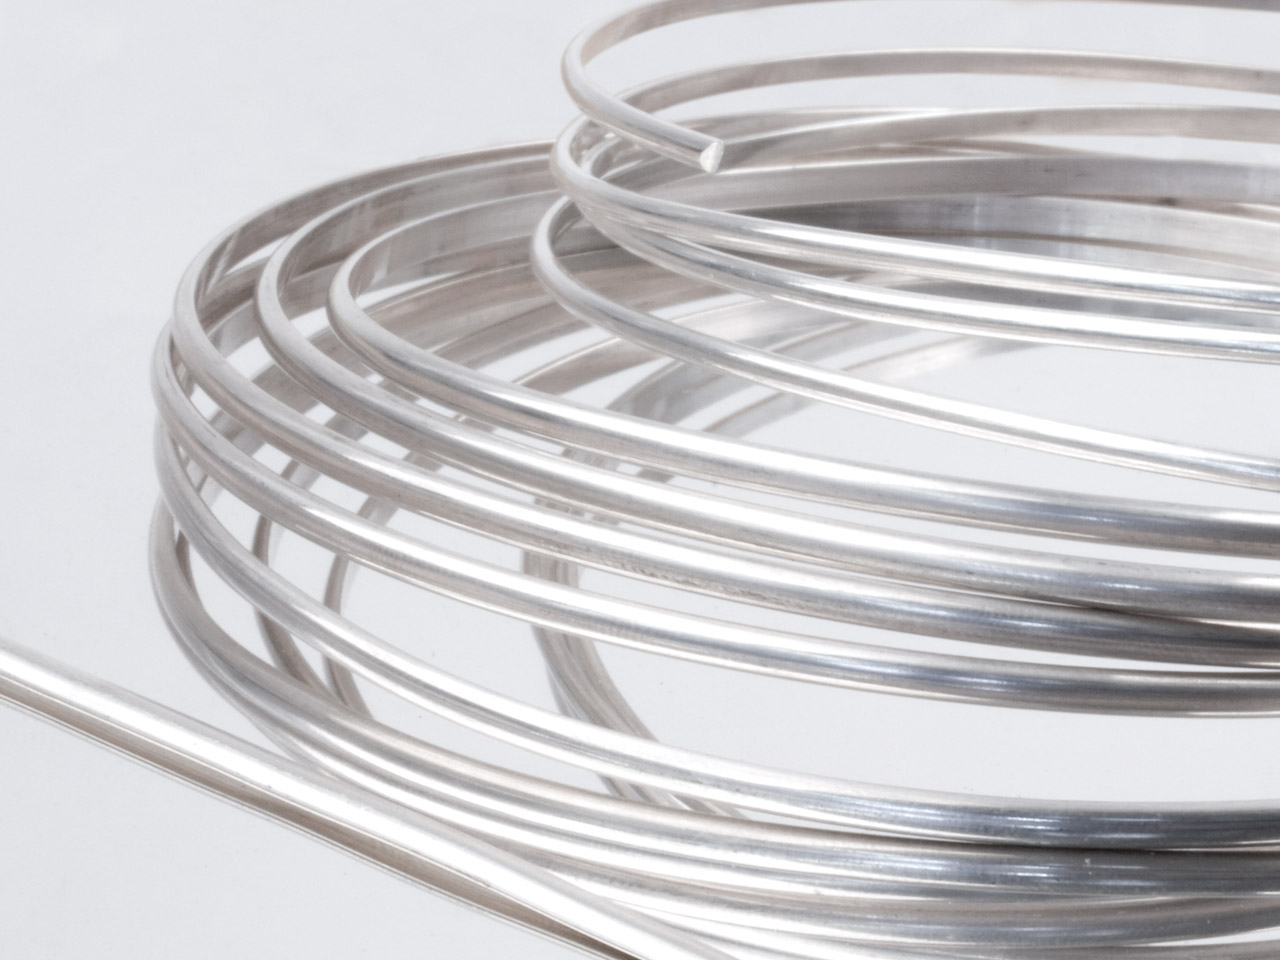 sterling silver d shape wire 4 00mm x 2 00mm 2618 cooksongold com sterling silver d shape wire 4 00mm x 2 00mm 2618